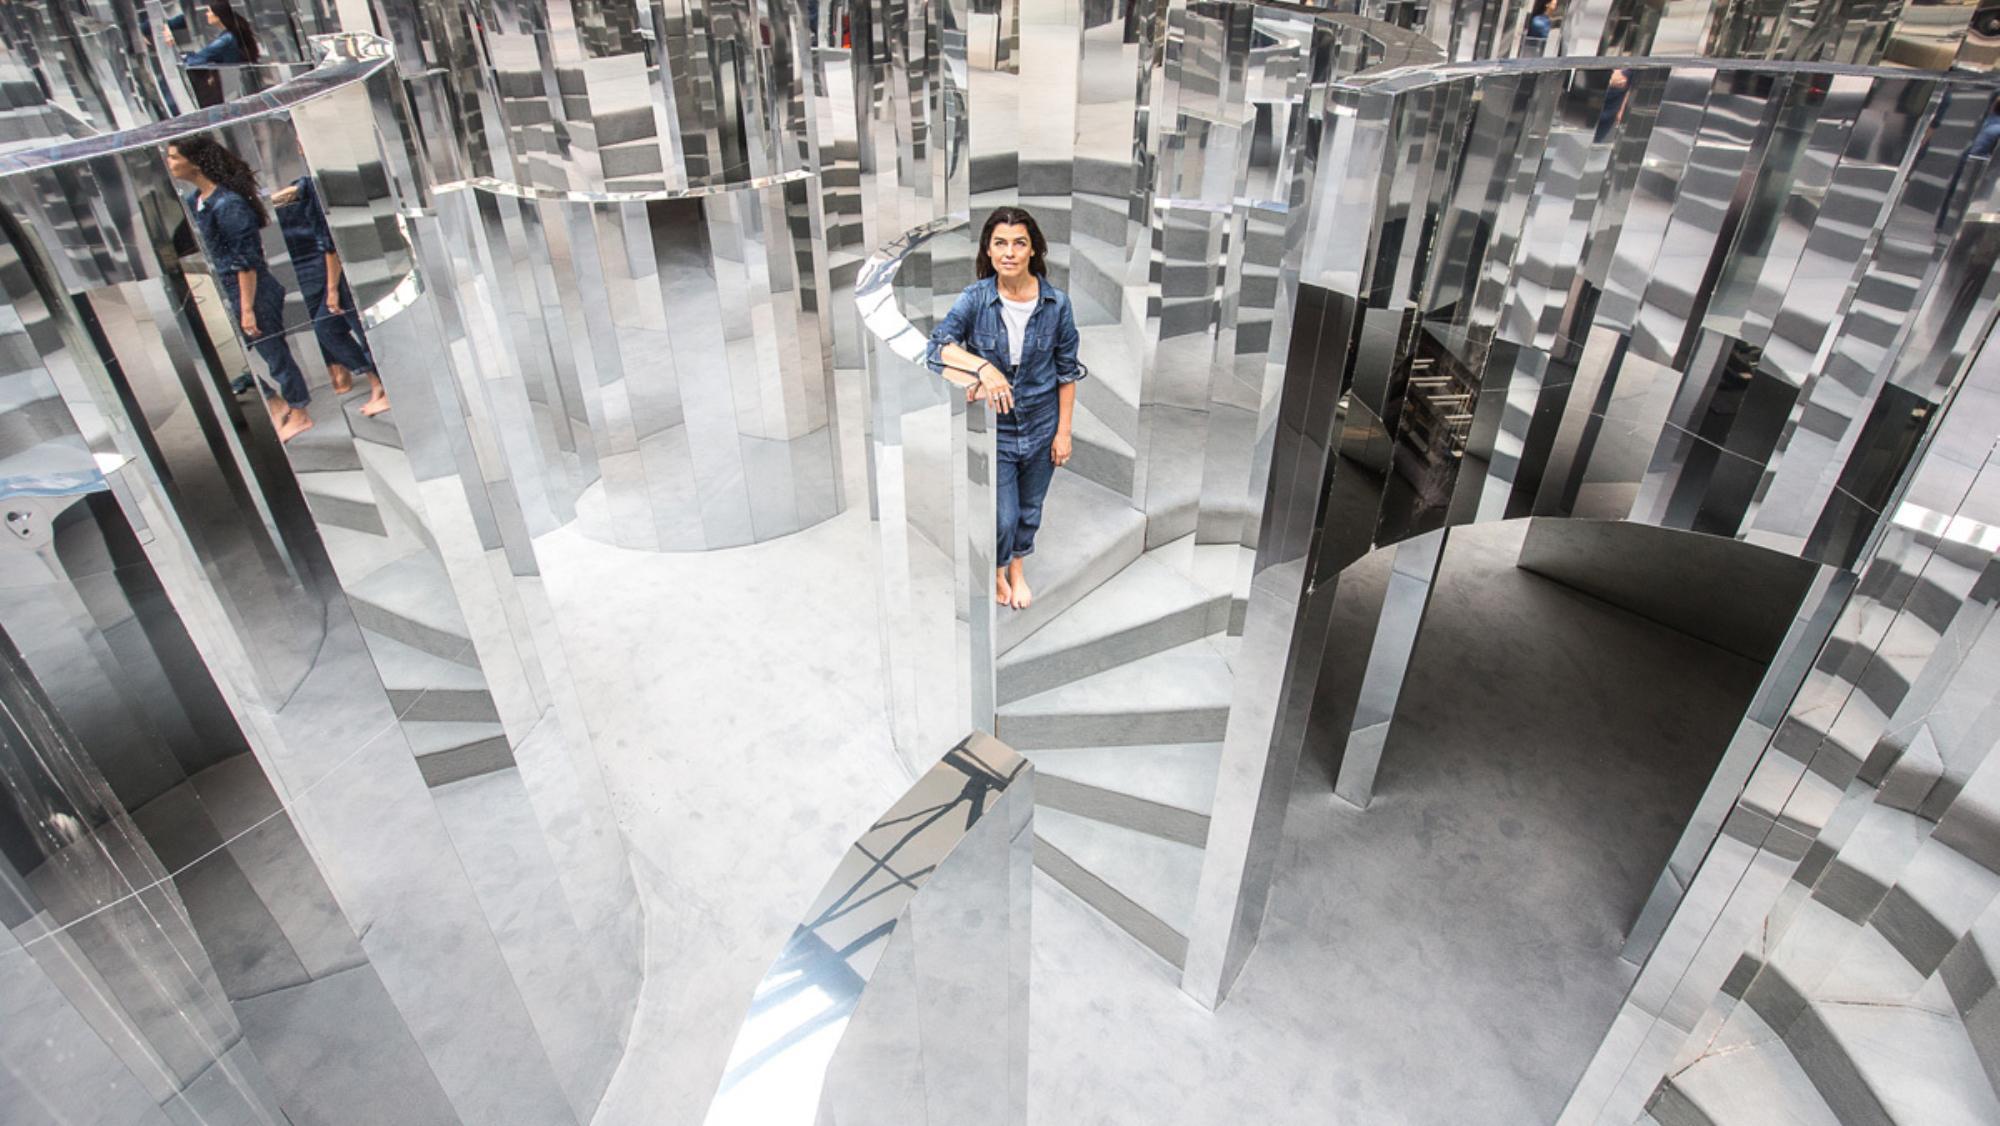 The Mirror Maze at Chanel's Fifth Sense Exhibition / Photo: i-d.vice.com